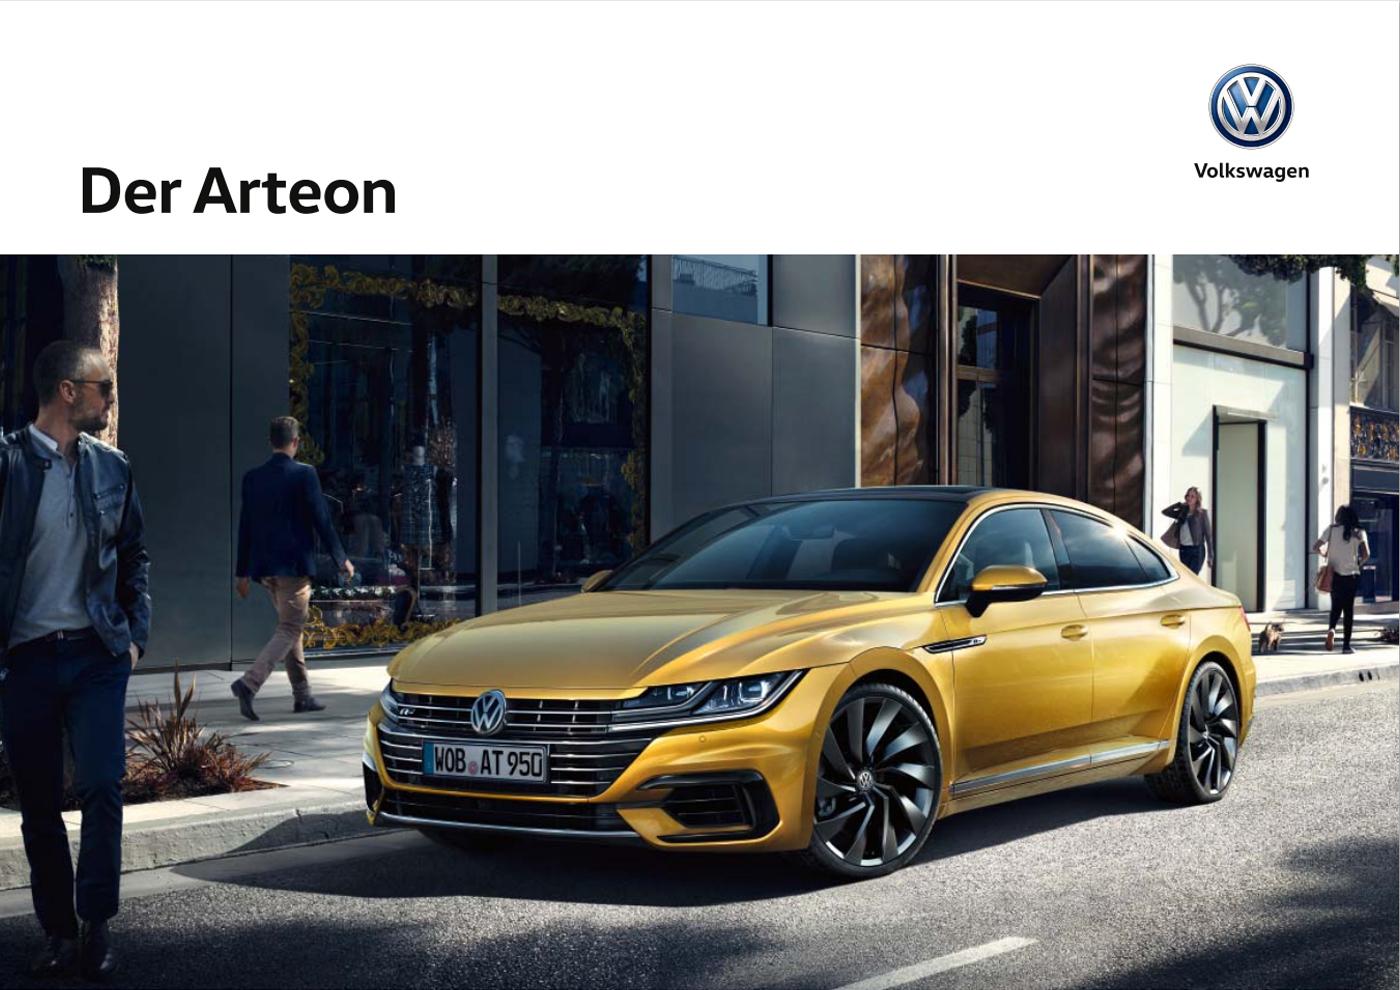 [DE]_VW_Arteon_brochure_2019.jpg